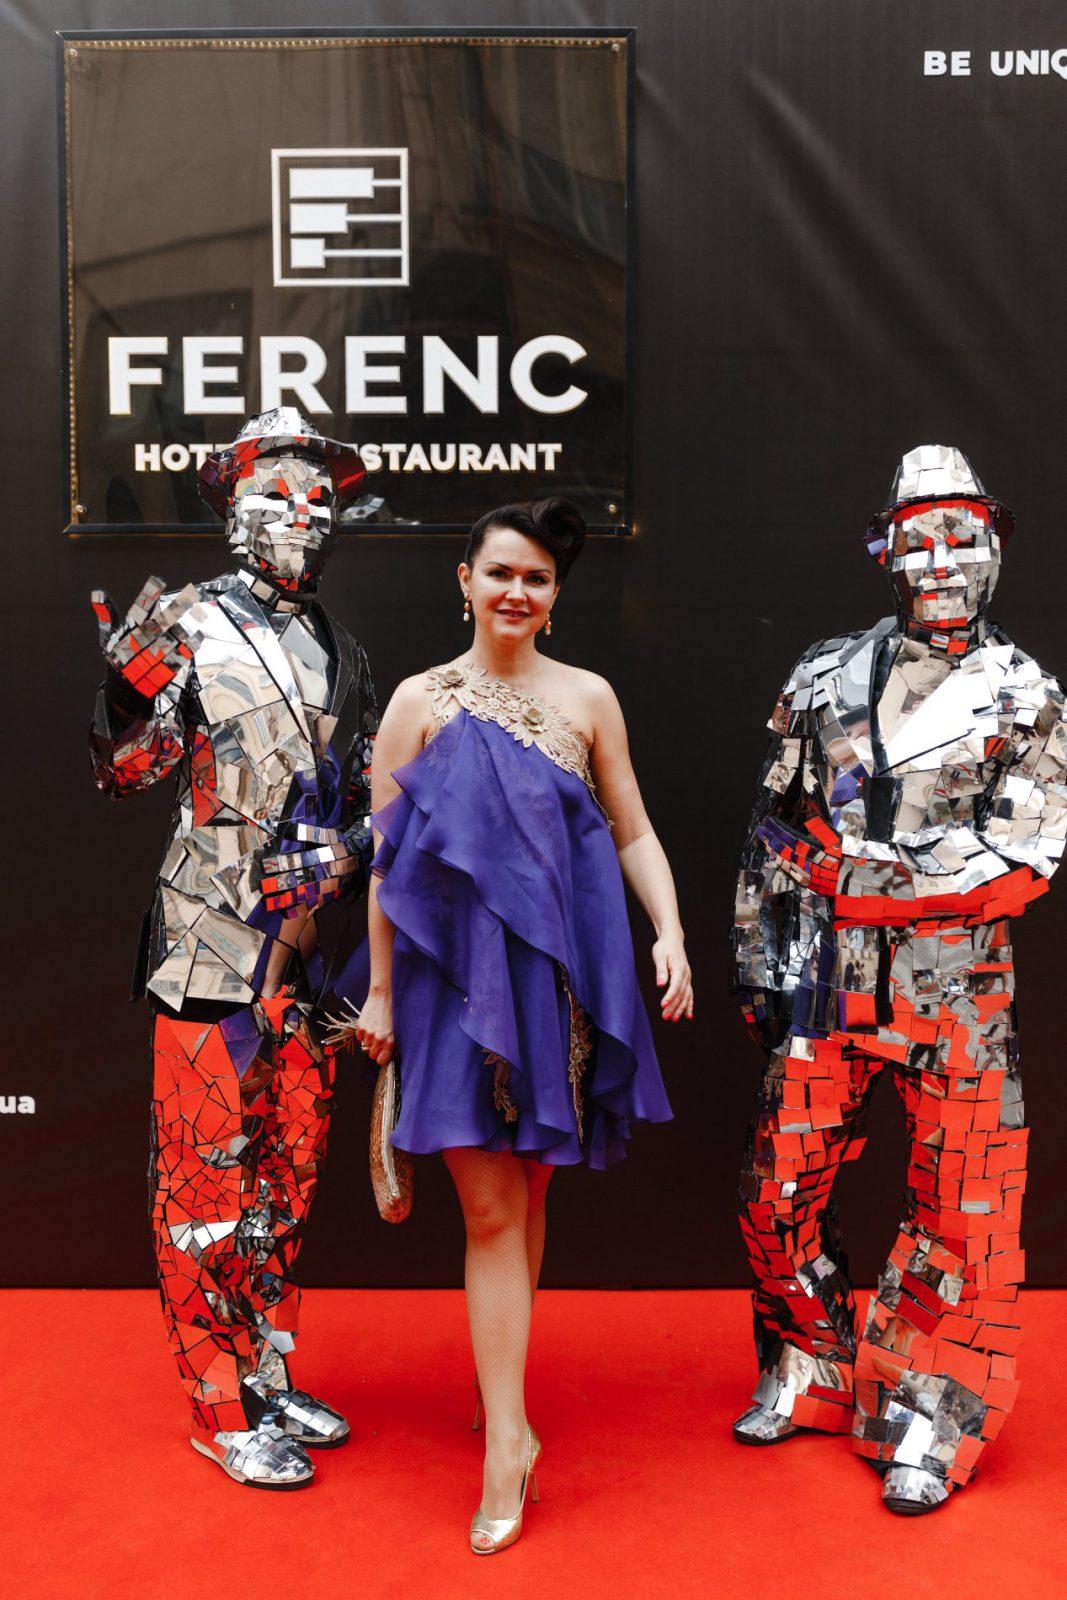 Ferenc0053